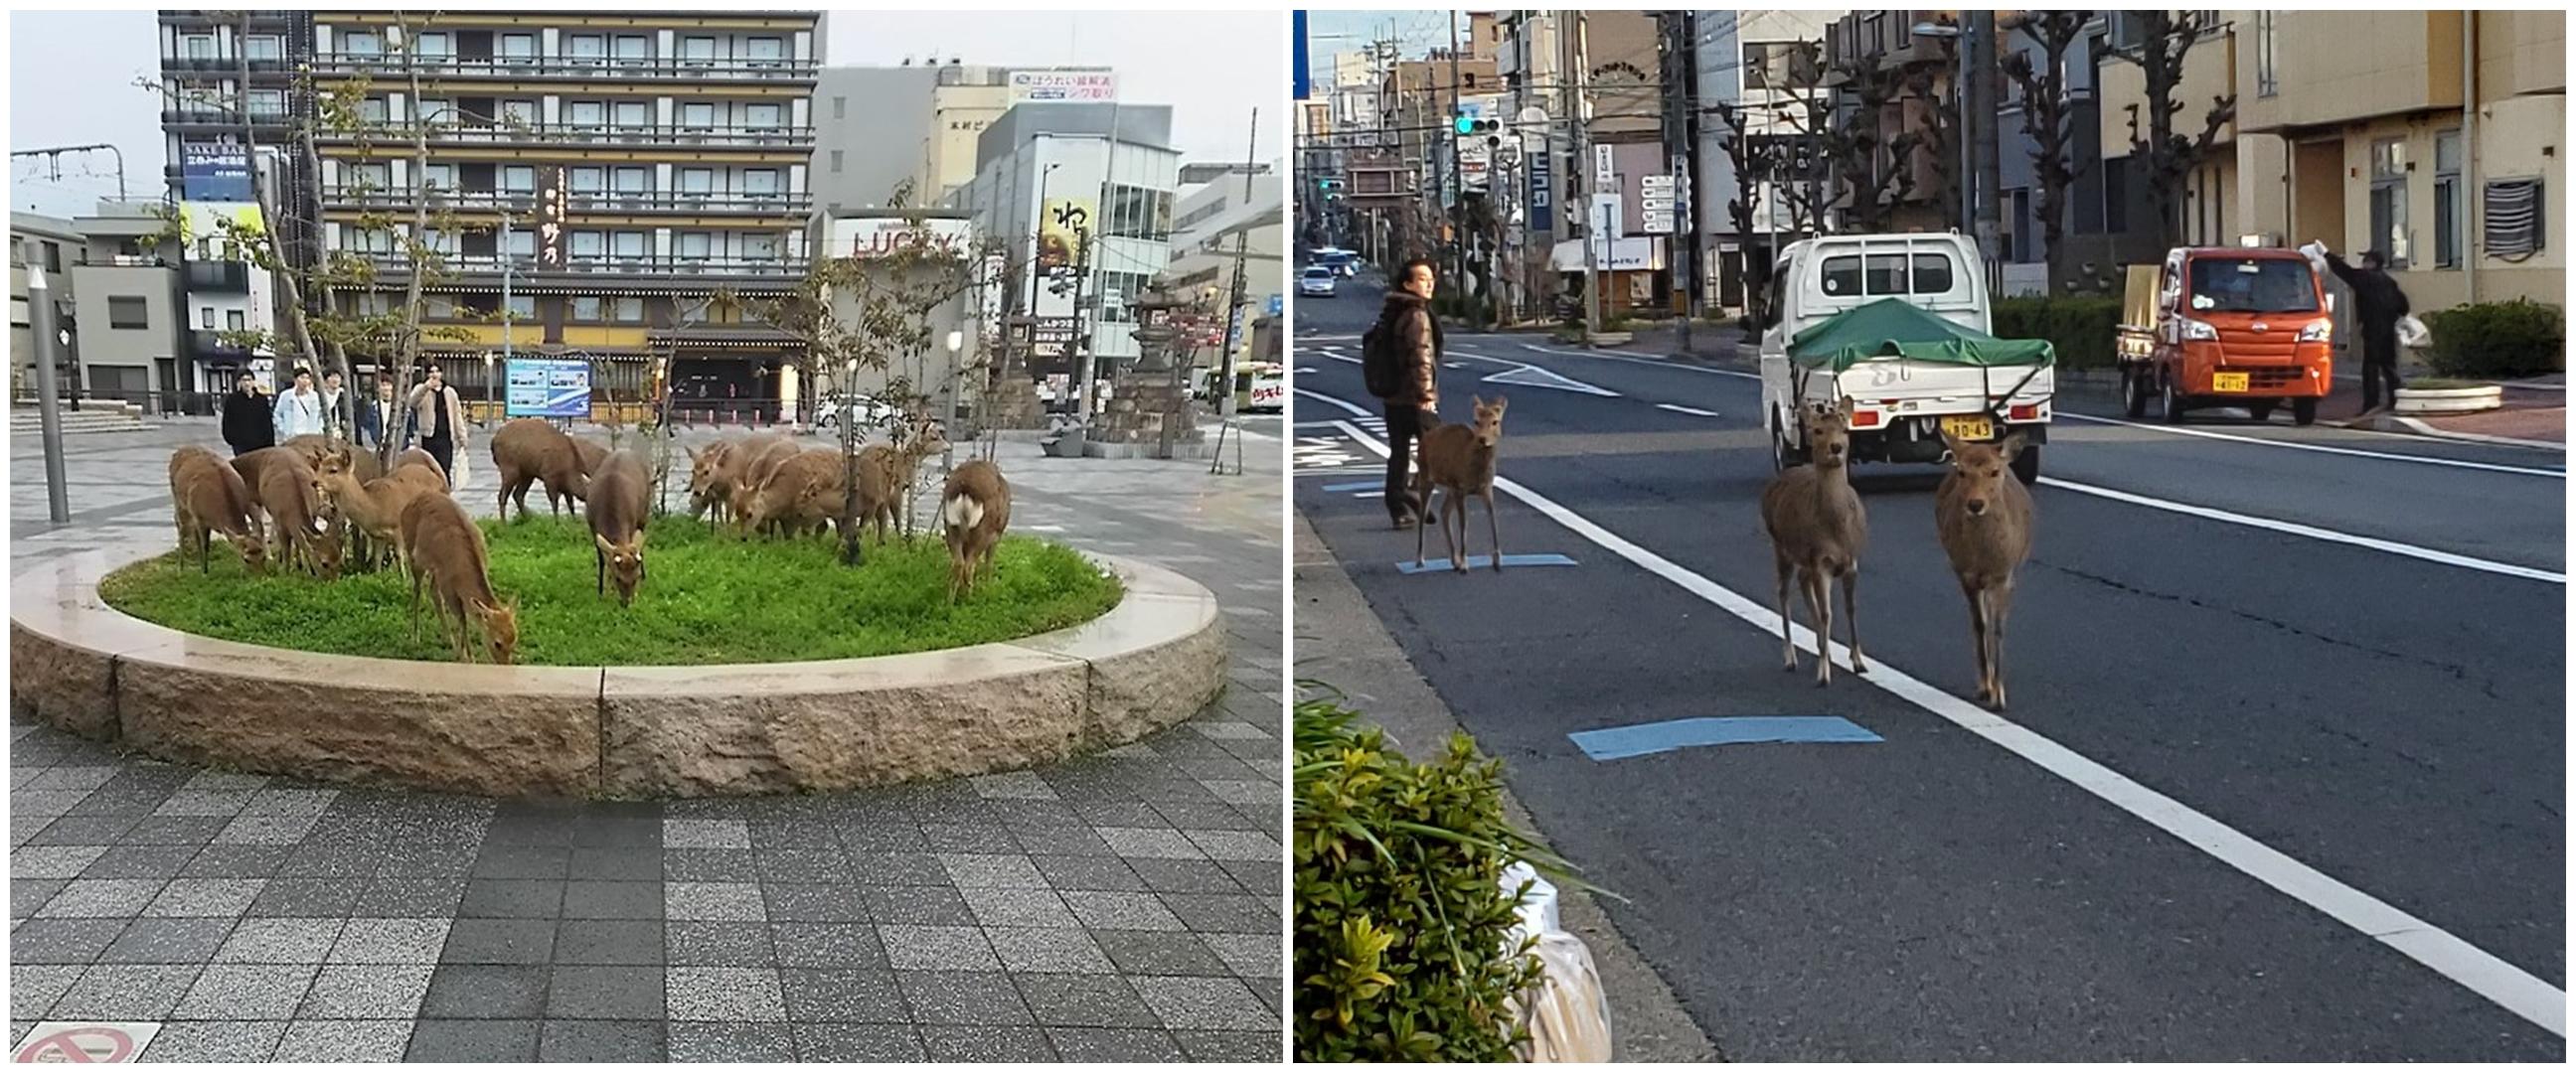 Dampak virus Corona, rusa berkeliaran ke jalan karena lapar